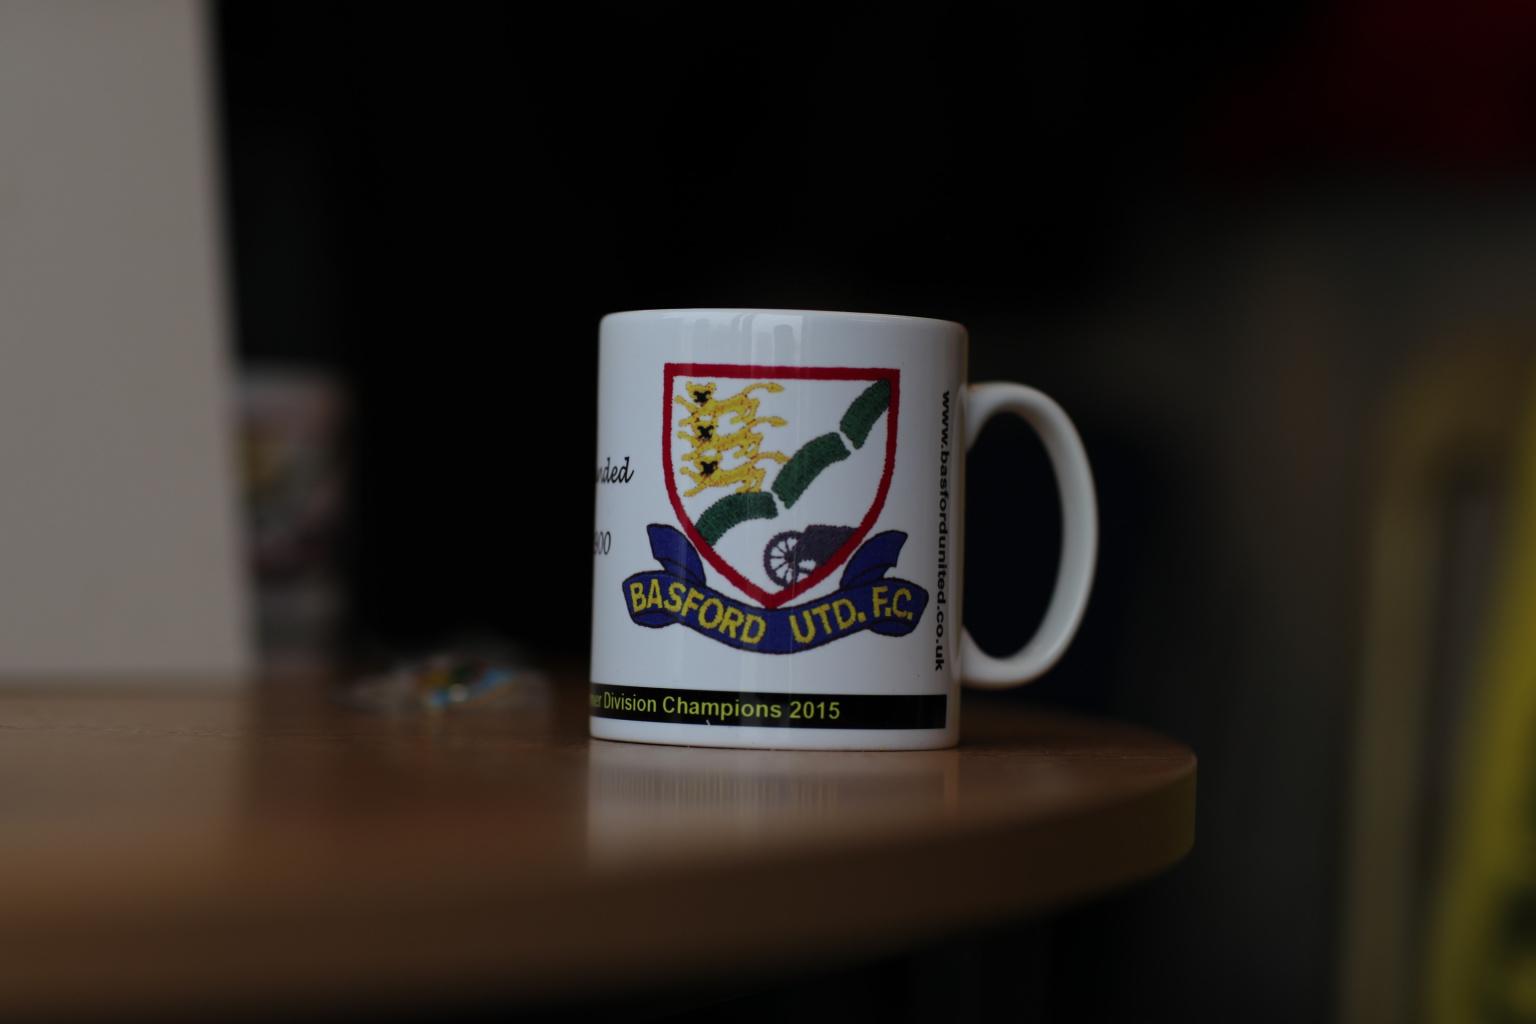 Image: Bespoke Club Mugs